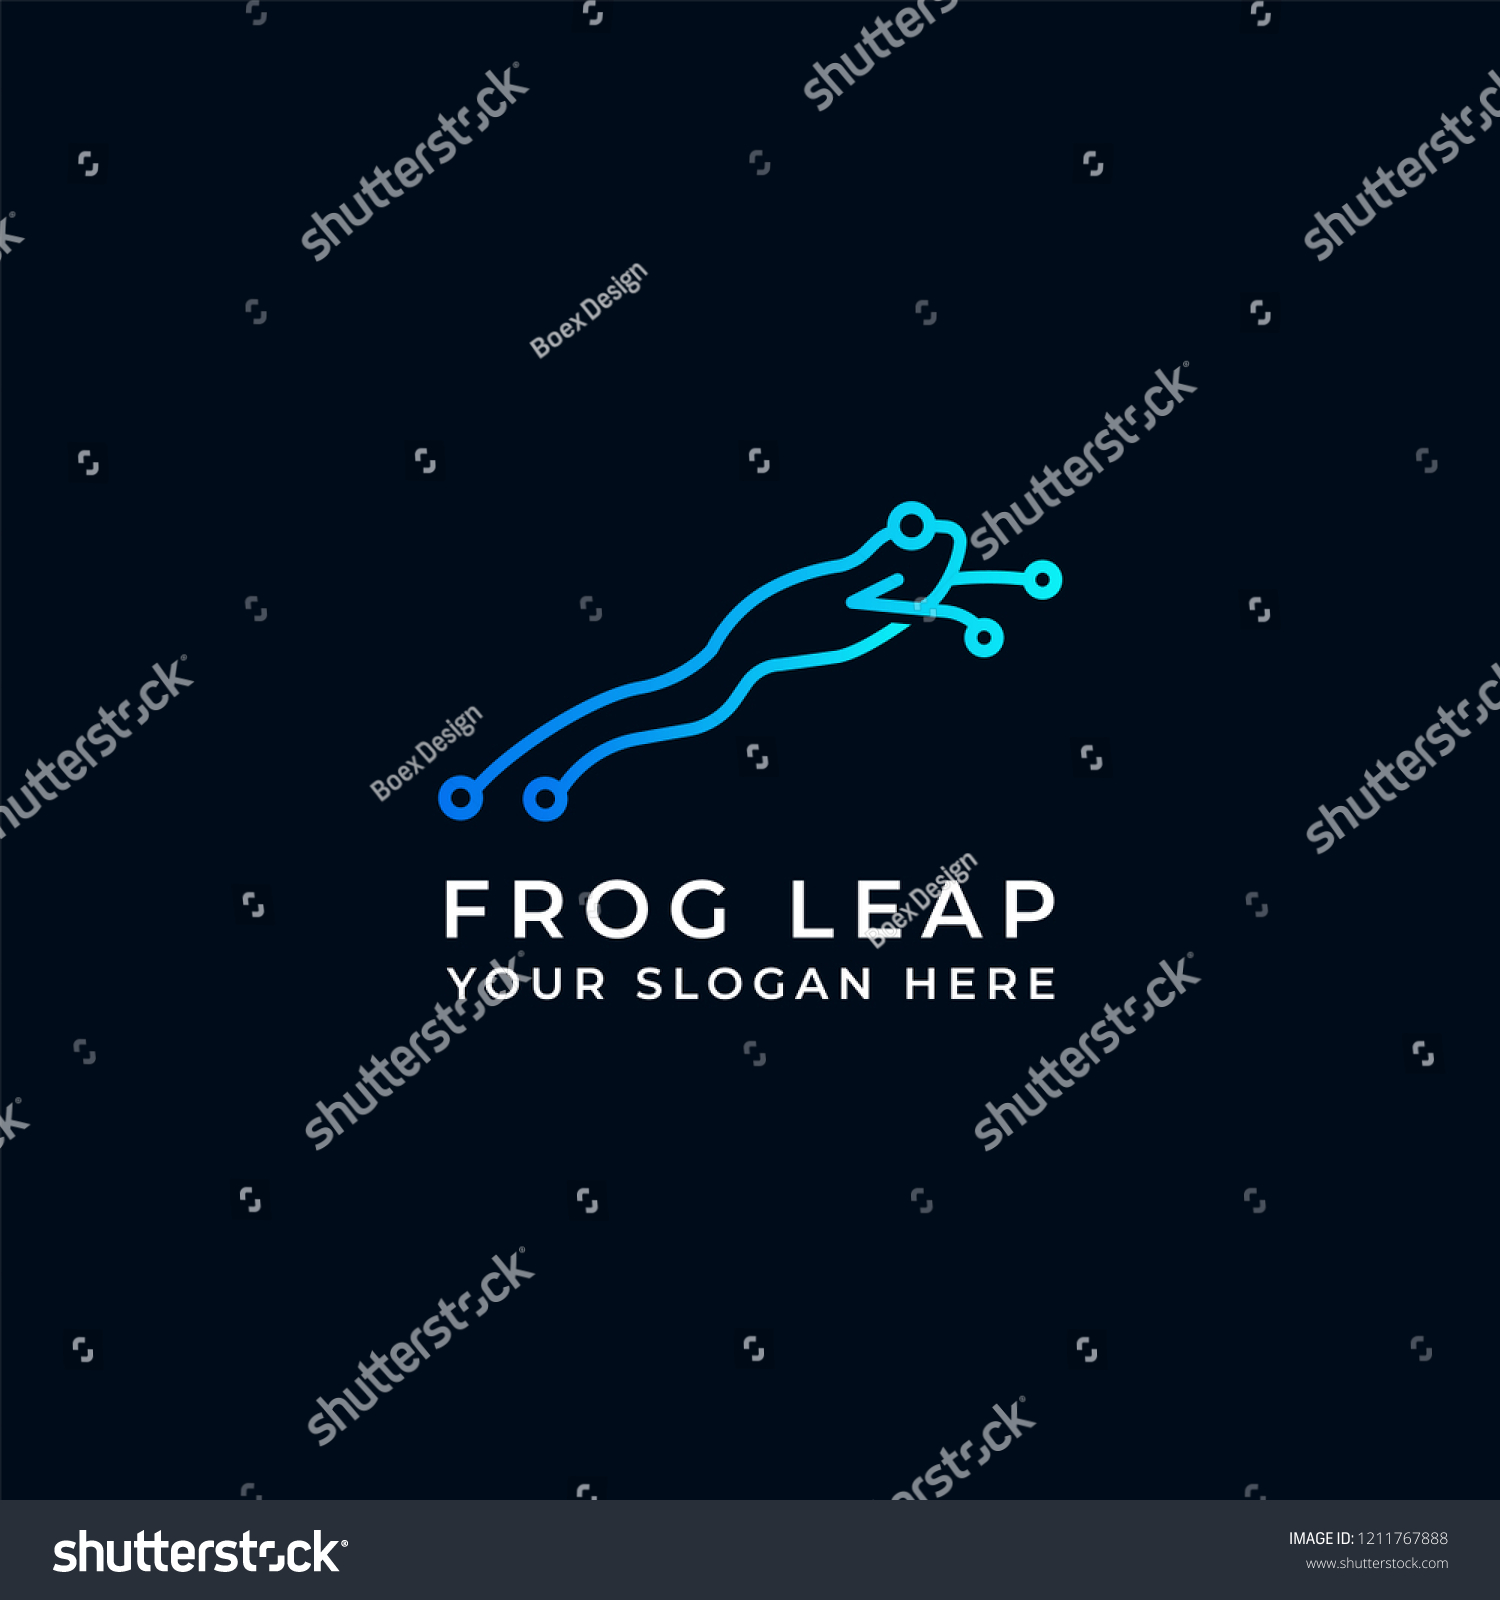 frog jump sirkuit technology logo stock vector royalty free 1211767888 https www shutterstock com image vector frog jump sirkuit technology logo 1211767888